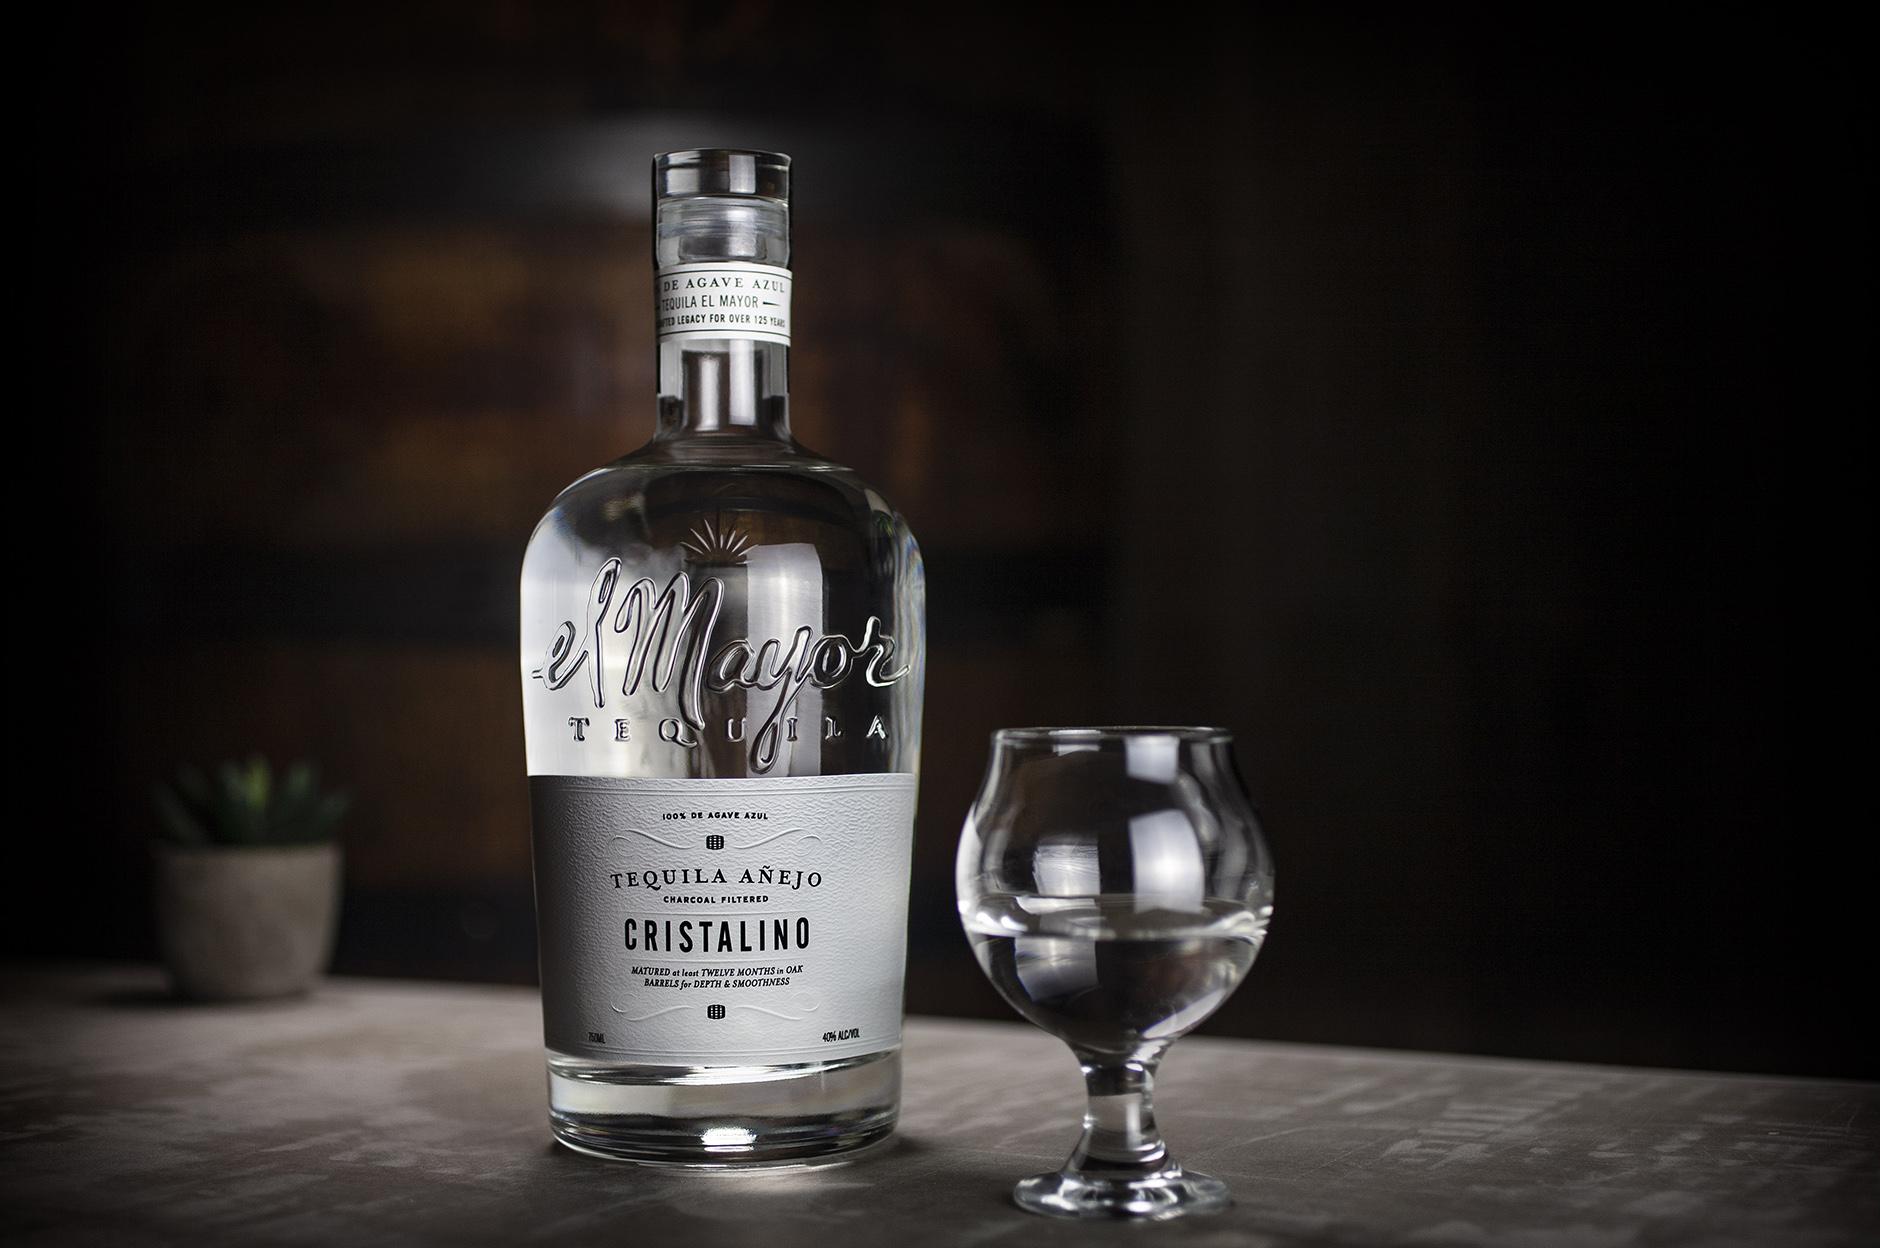 Tequila El Mayor Cristalino Bottle Design